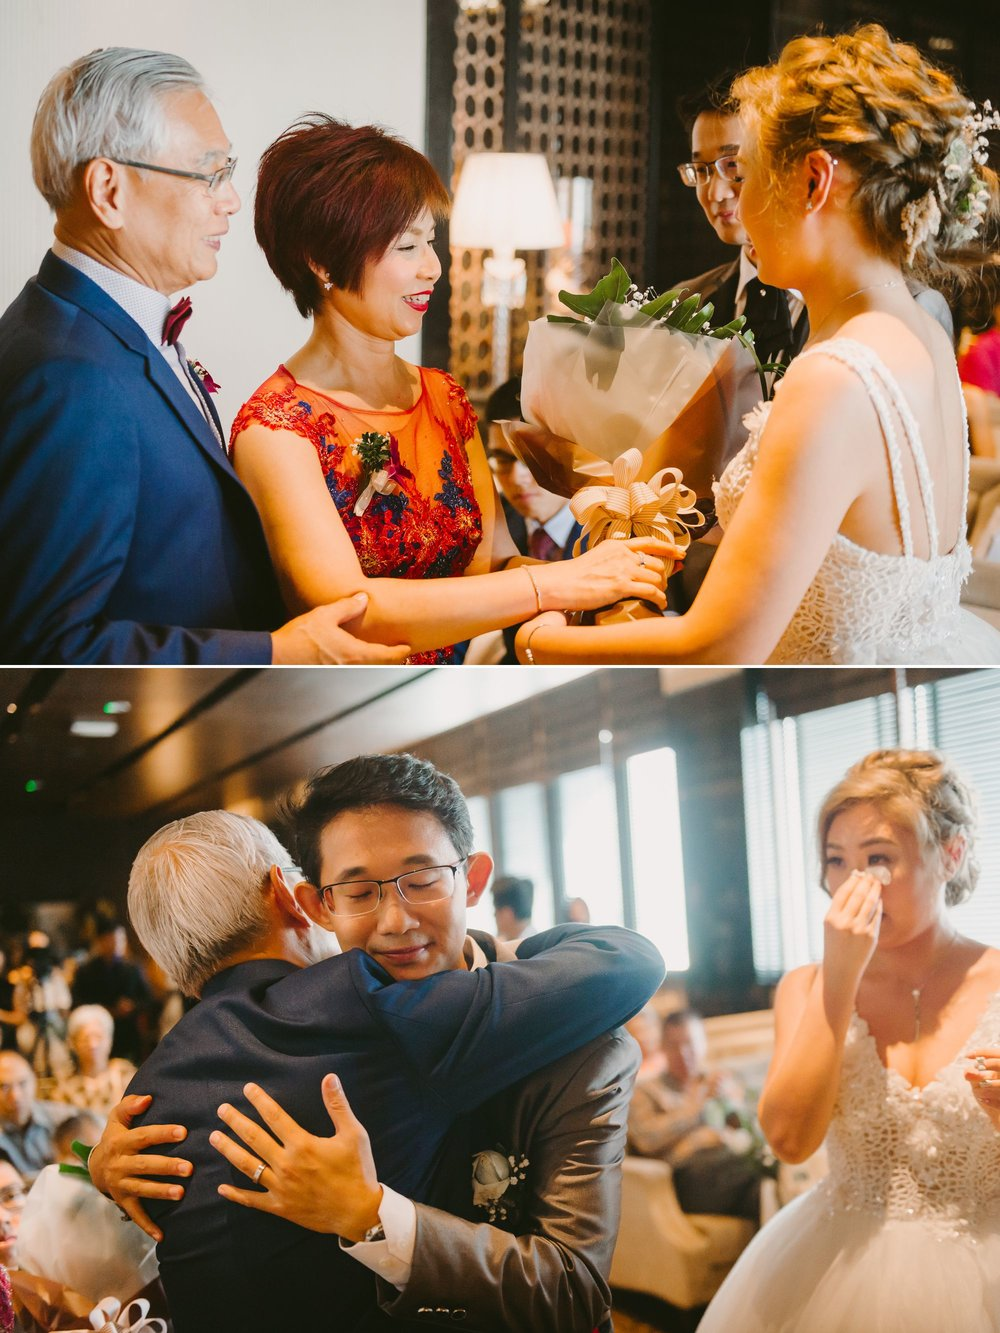 wedding_photographer_singapore 25.jpg